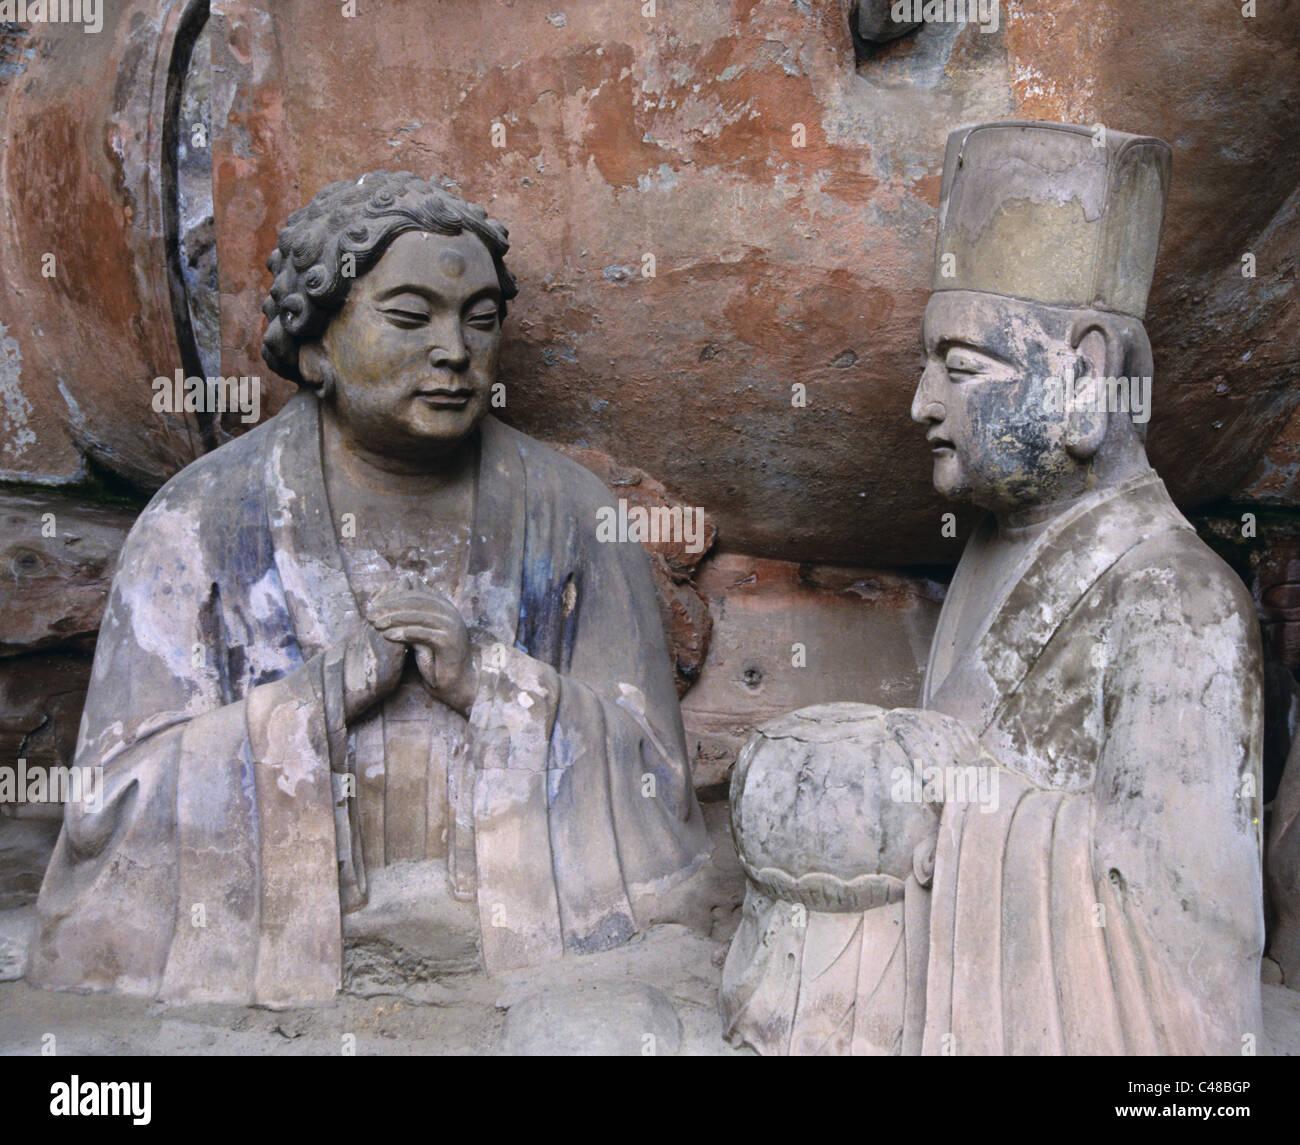 Curly headed figure by the Recumbent Buddha (1174-1252 AD), Baodingshan, Dazu, China 990603_1719 - Stock Image